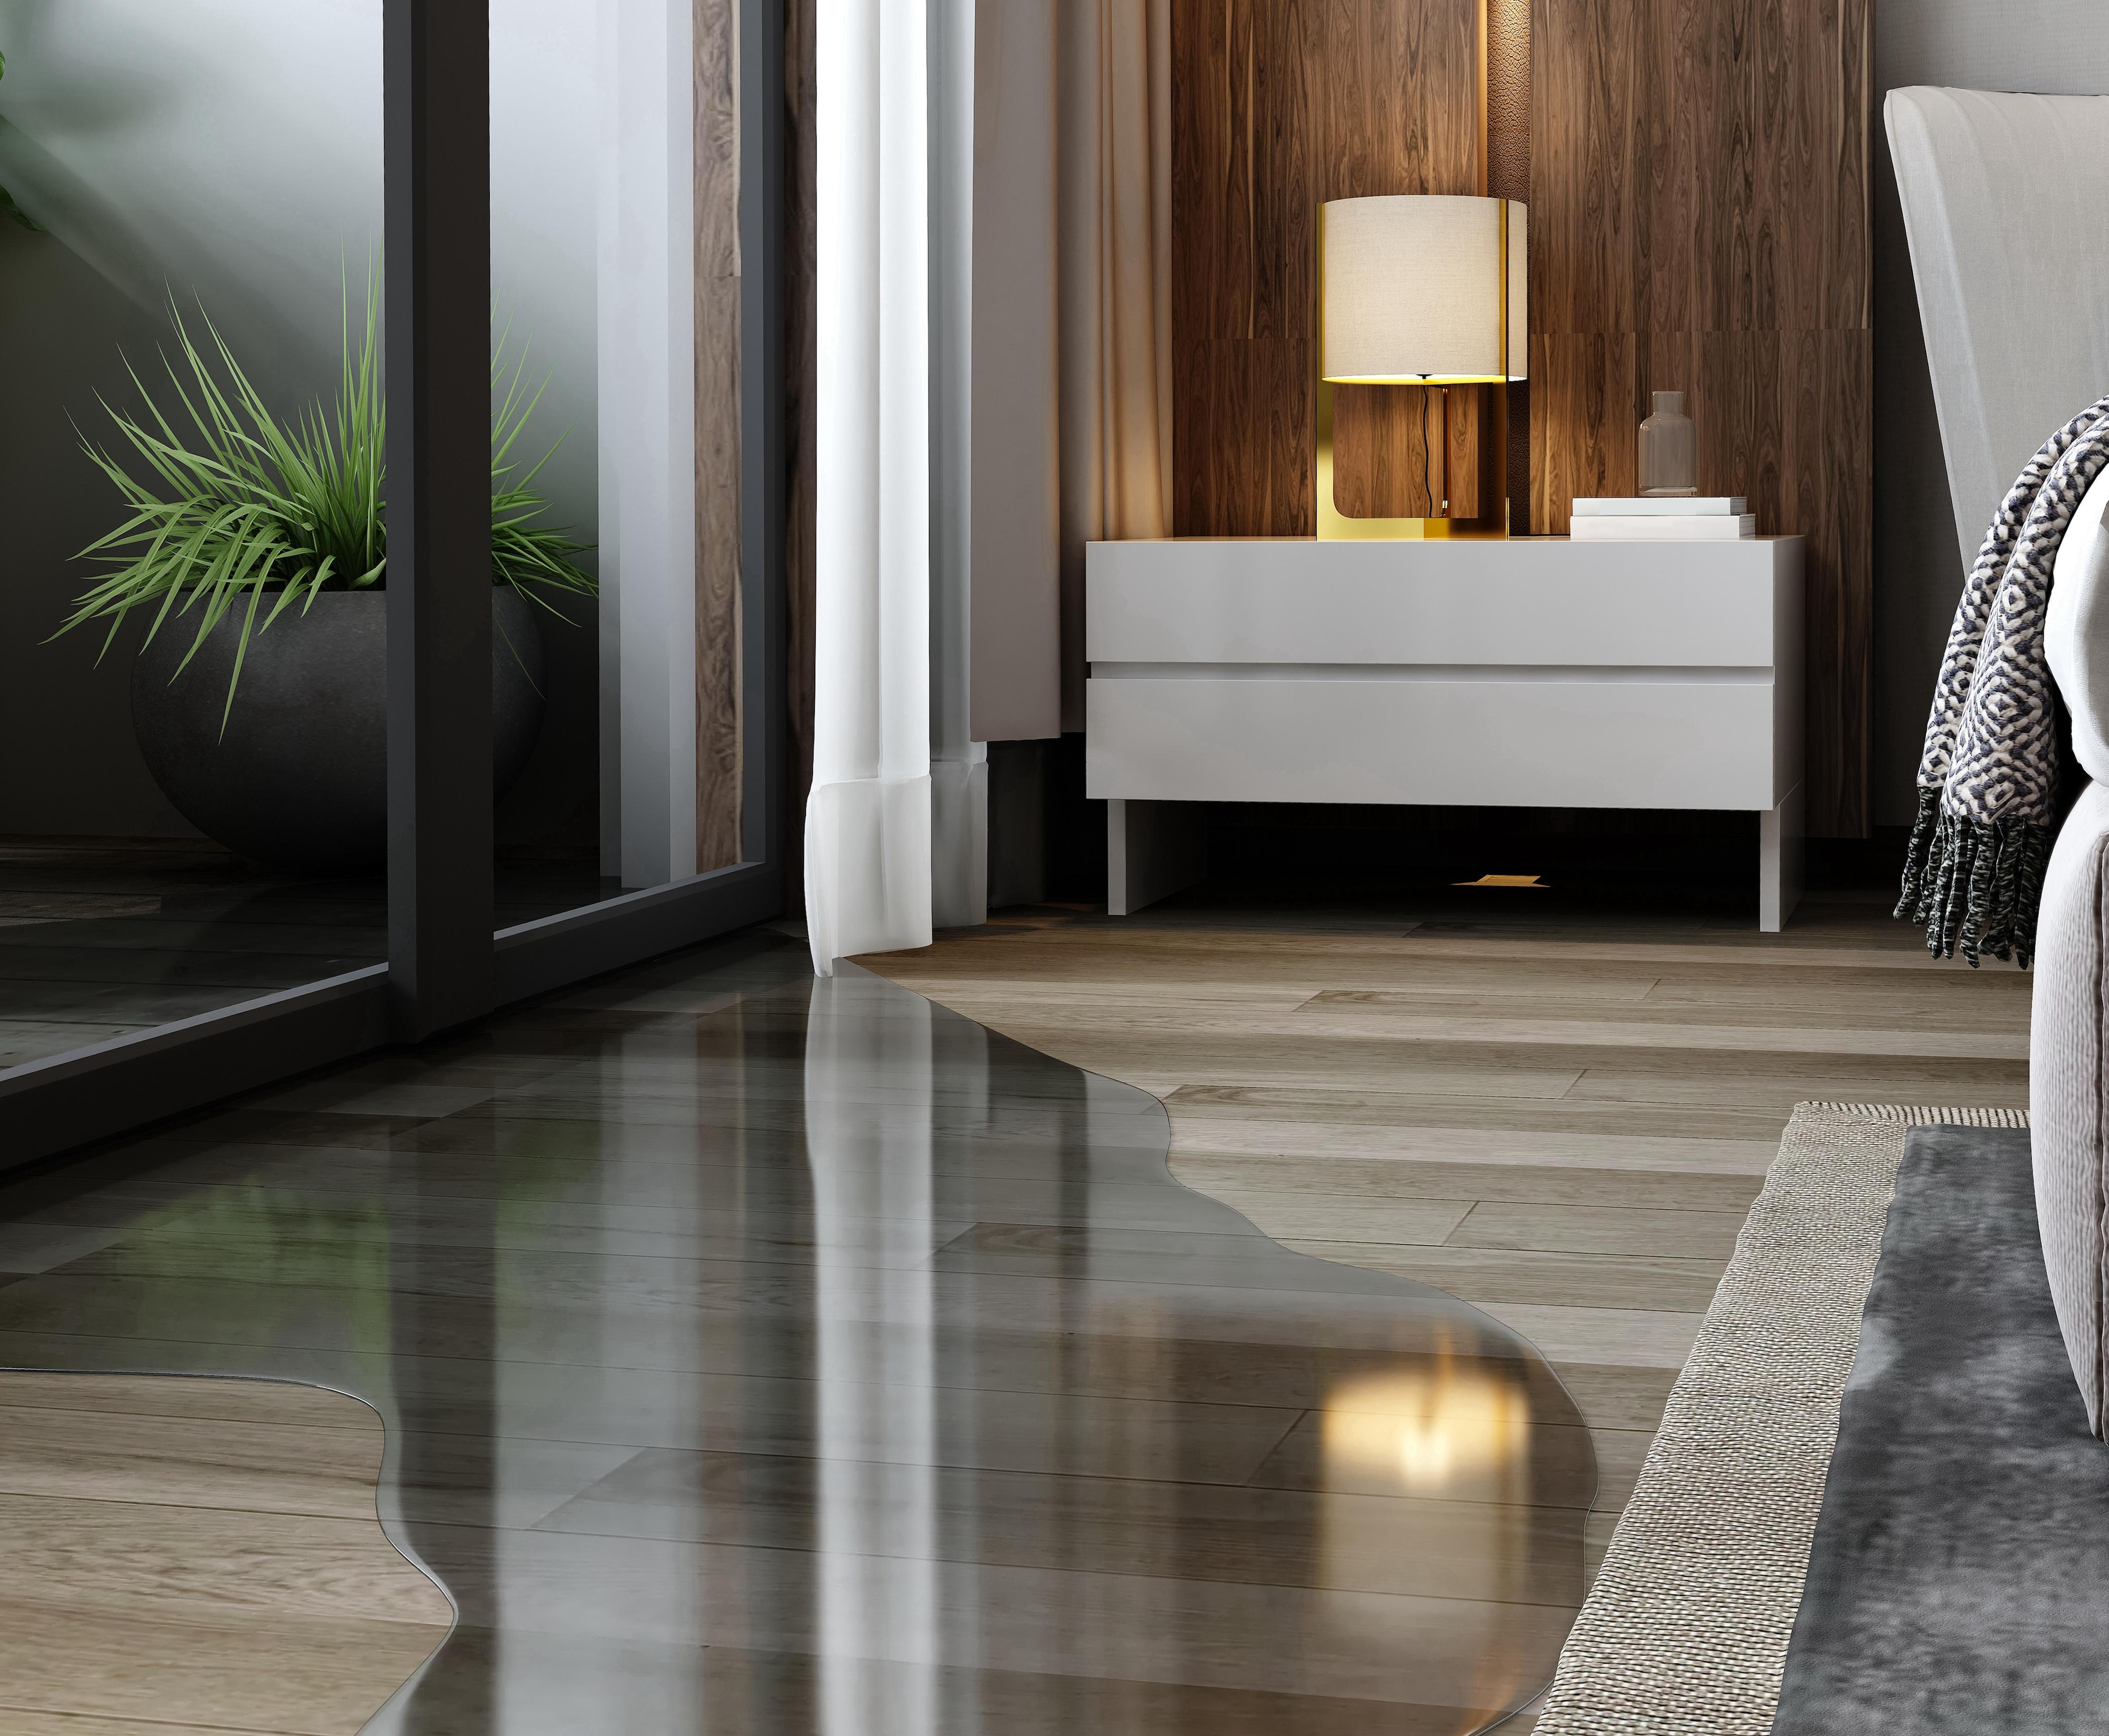 water on a wooden floor